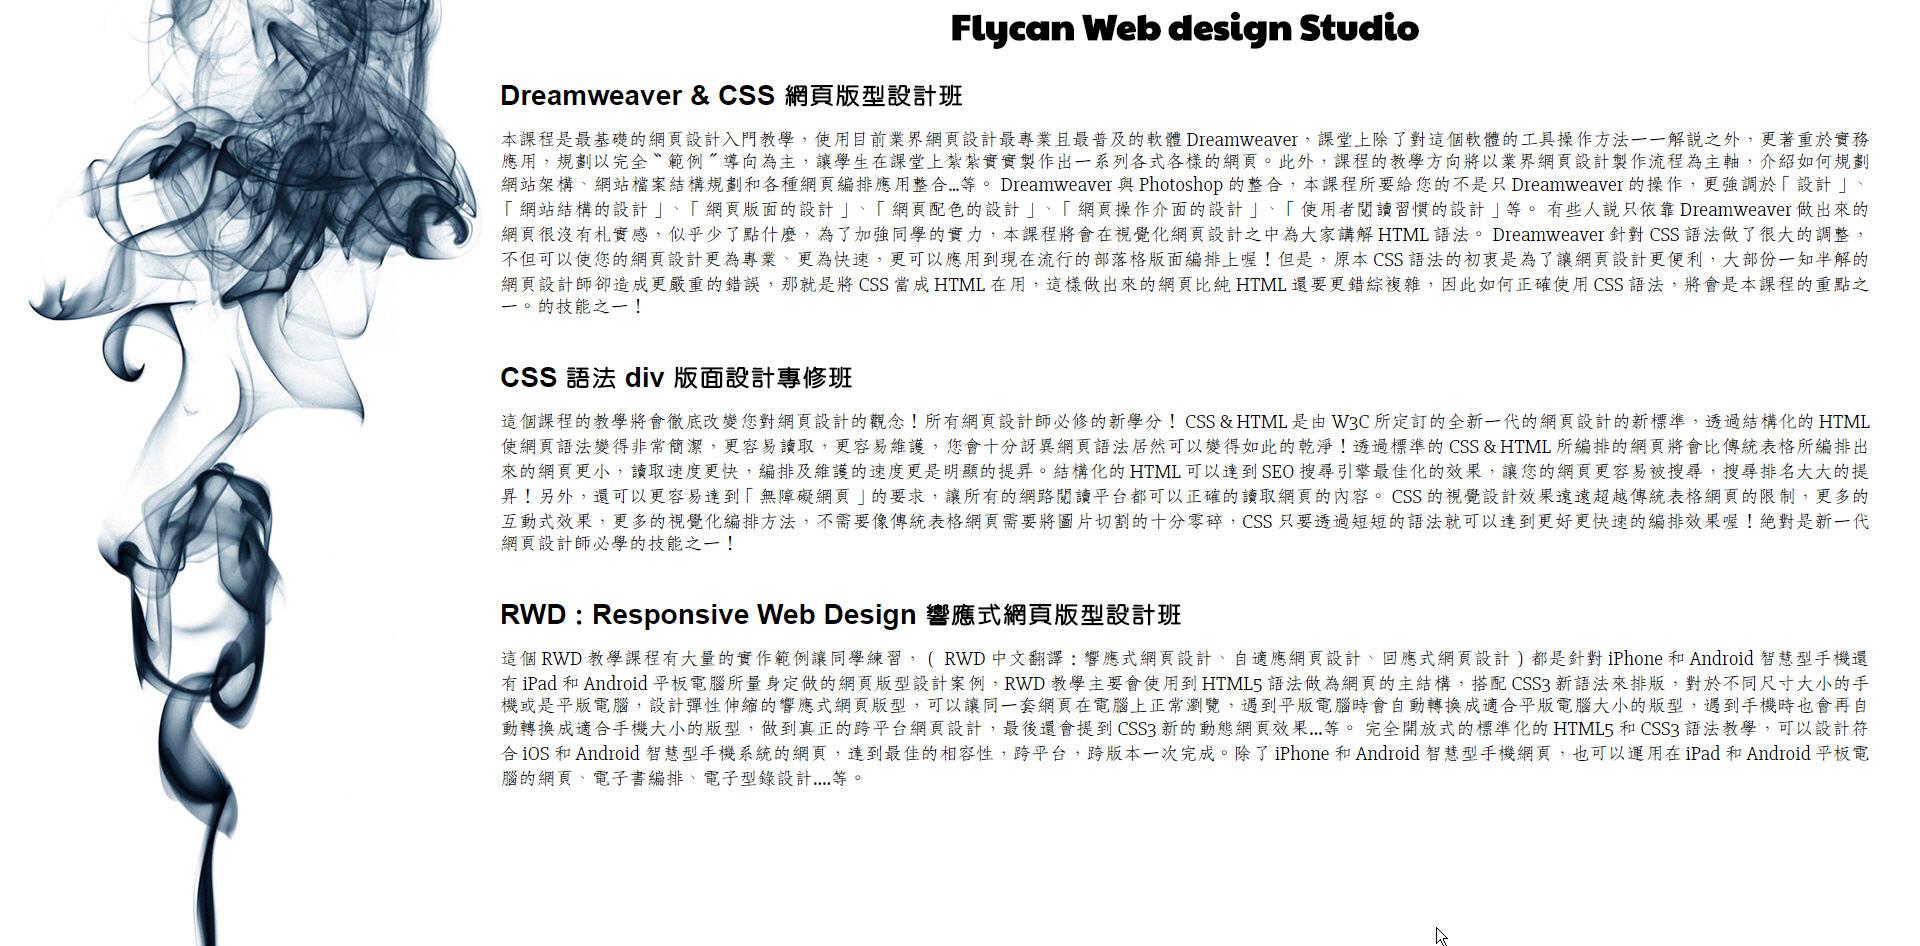 CSS 語法 - 網頁設計 Free Resource 好康報報 Good Design 好站報報  - 【設計資源】 - Google Fonts 免費雲端字庫-實作篇 - okok